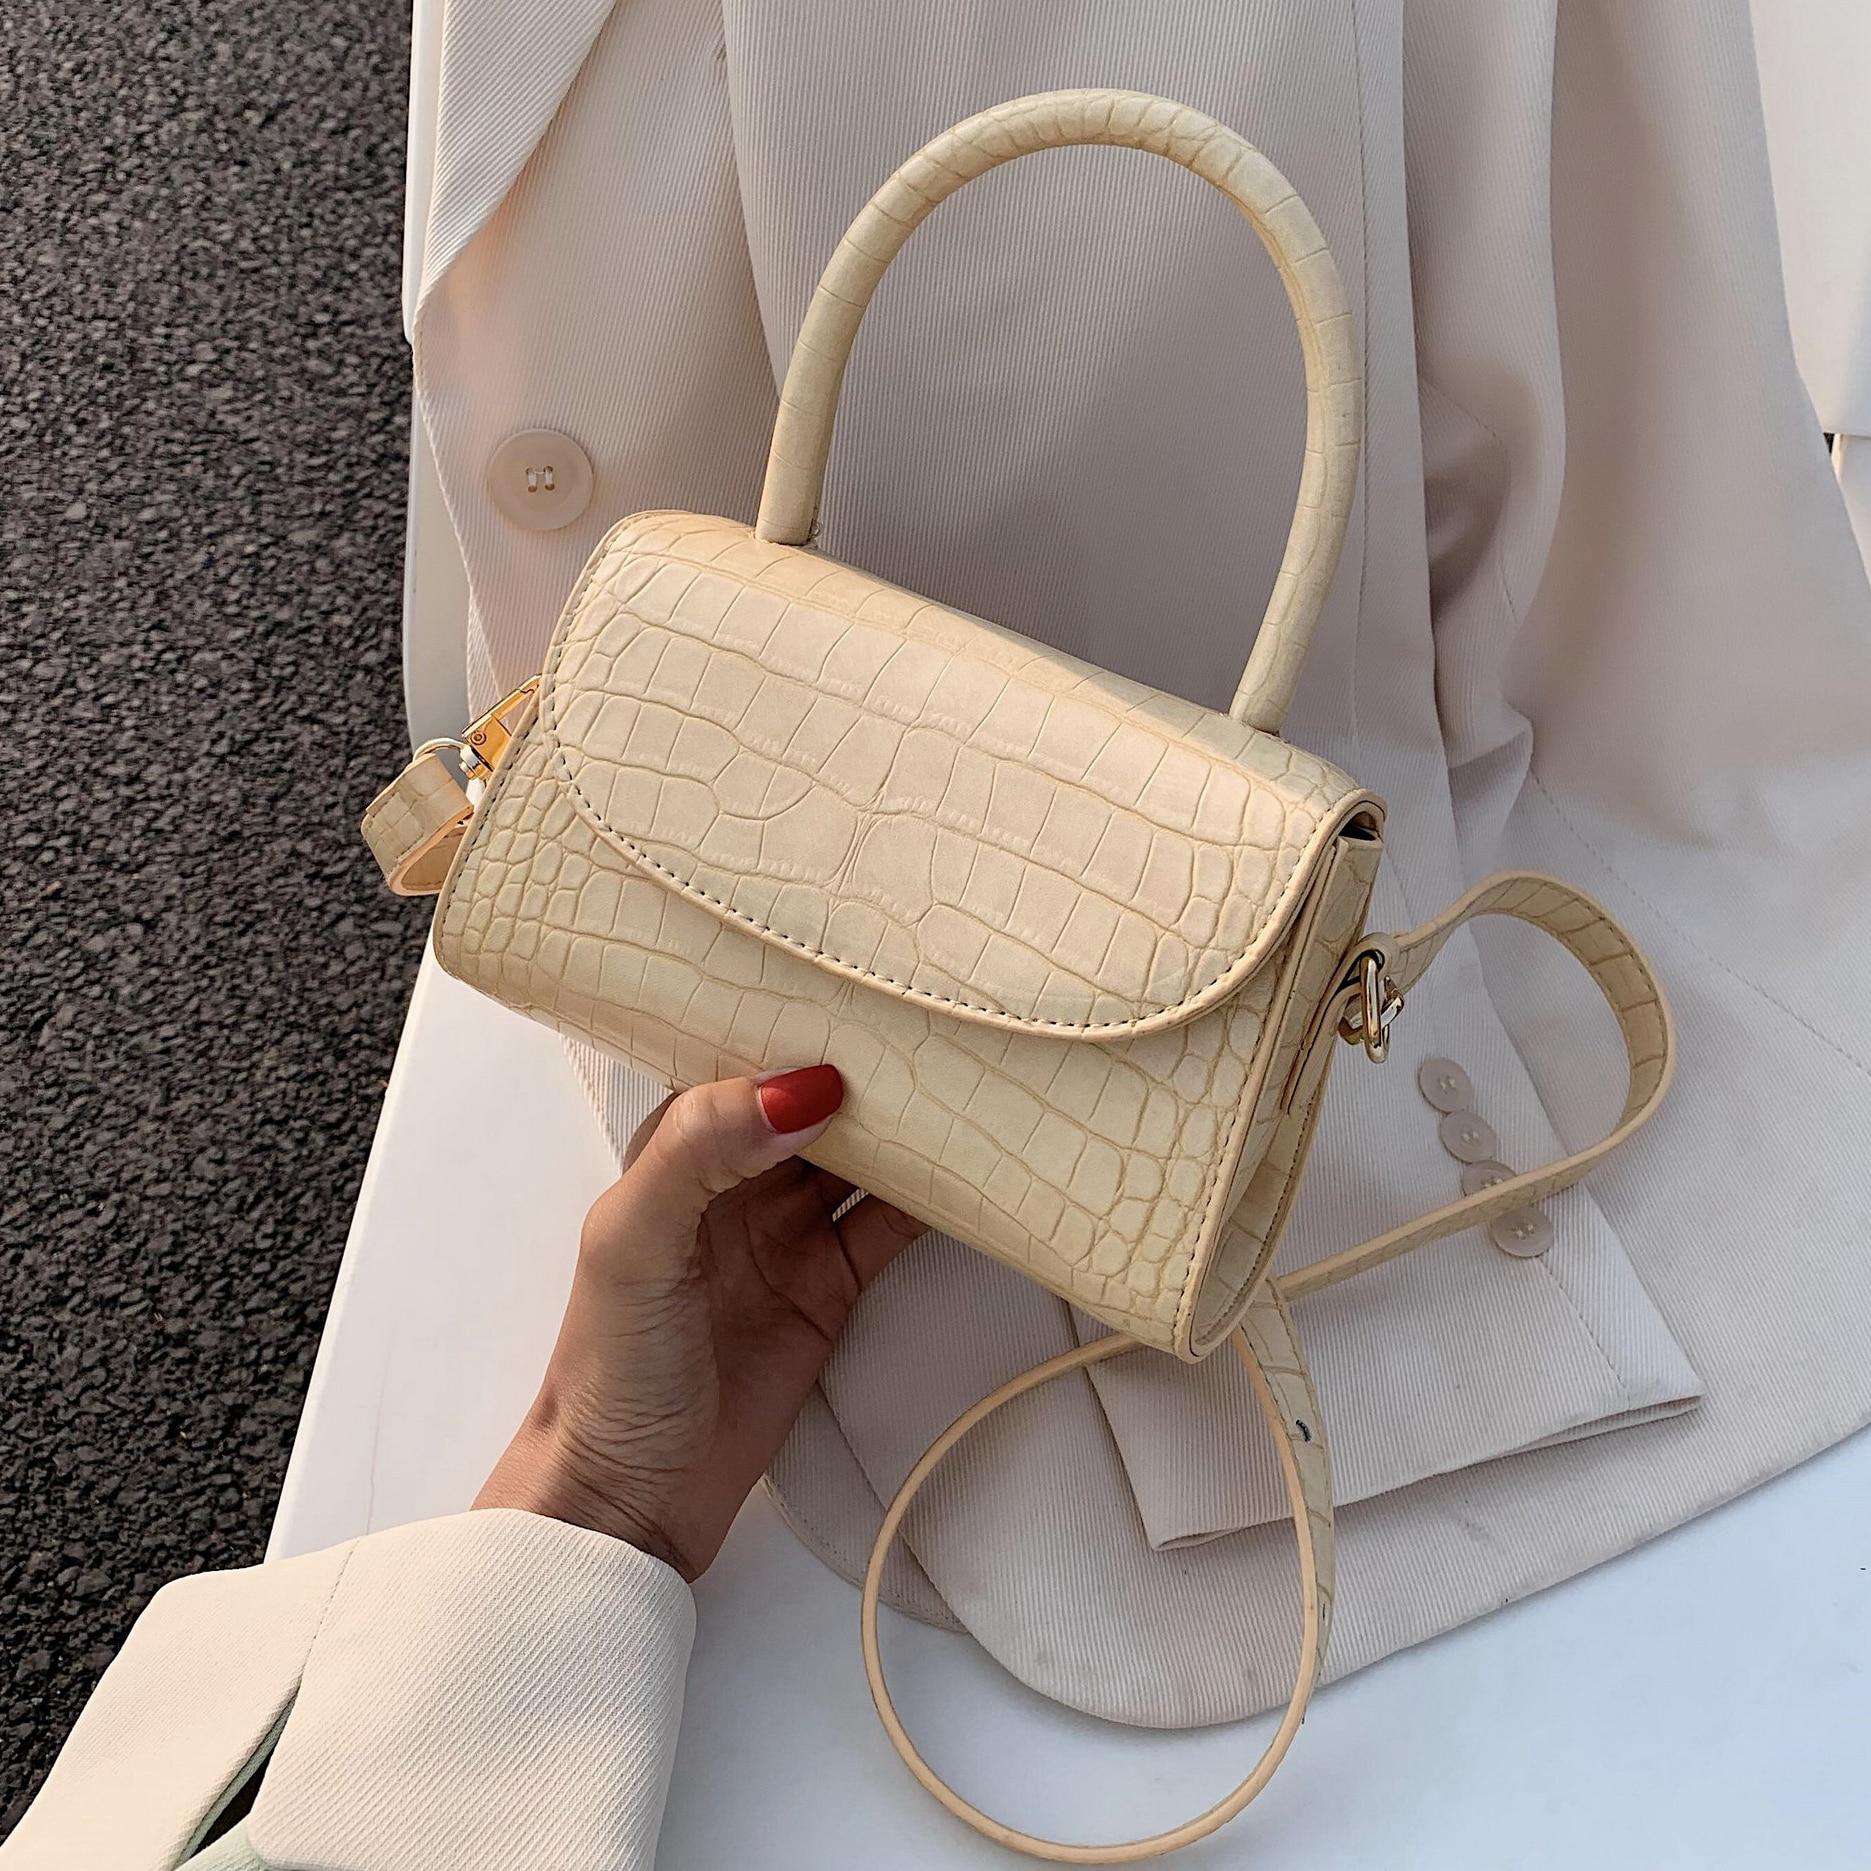 MINI Stone Pattern Small PU Leather Crossbody Bags For Women 2020  Shoulder Handbags Female Travel Totes Cross Body Bag